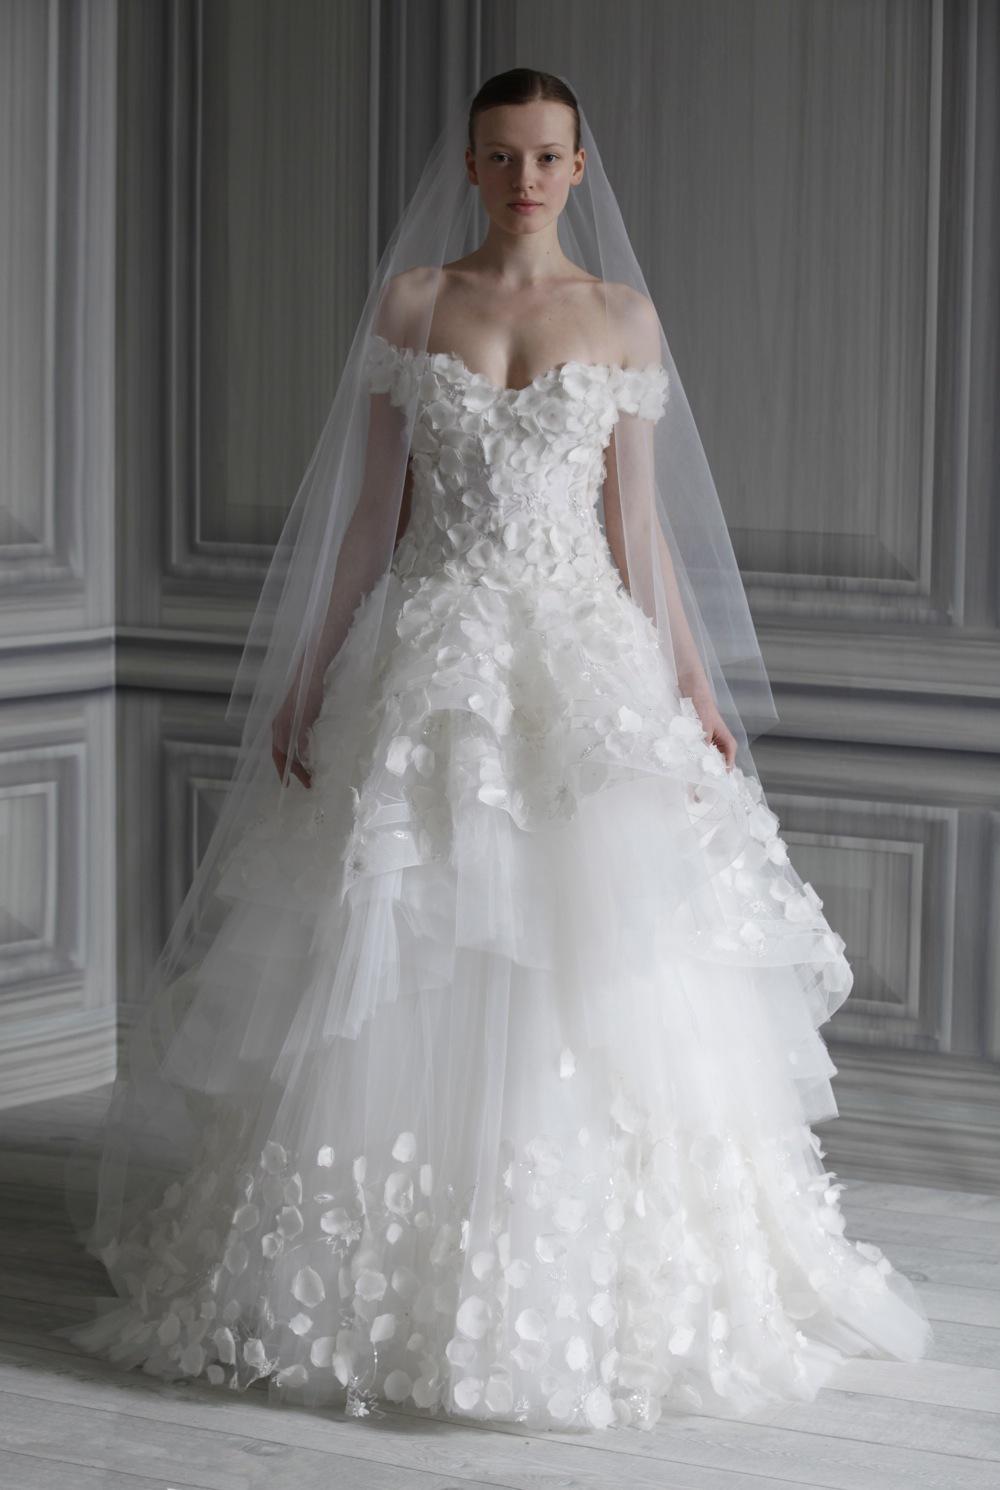 Wedding-dress-monique-lhuillier-bridal-gowns-spring-2012-petal.full